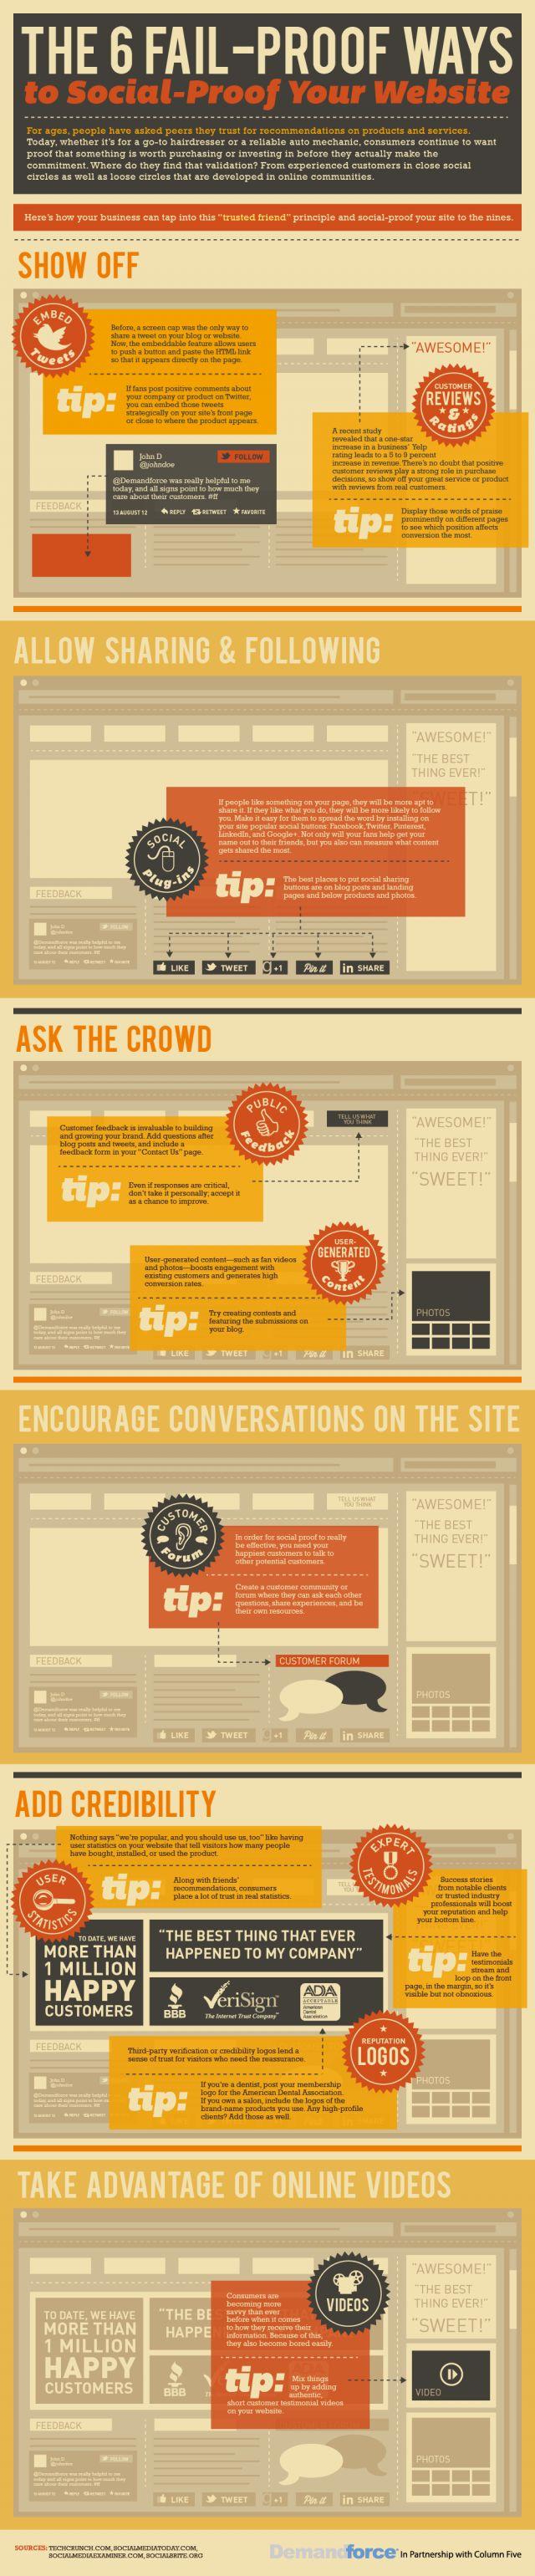 Social Proof Your Website